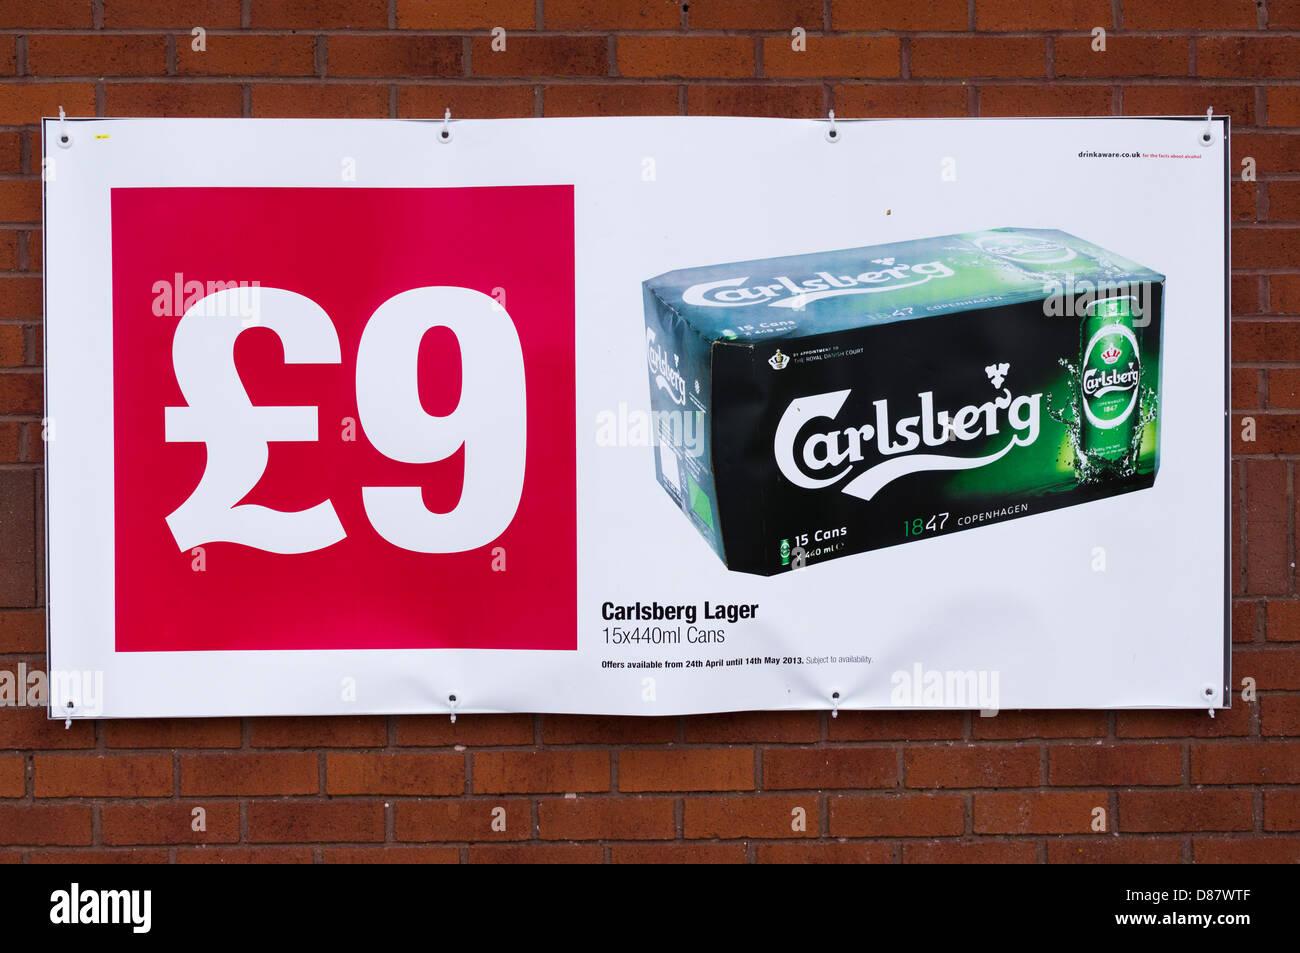 Günstige Lager Plakat an einem Coop-Supermarkt, UK Stockbild